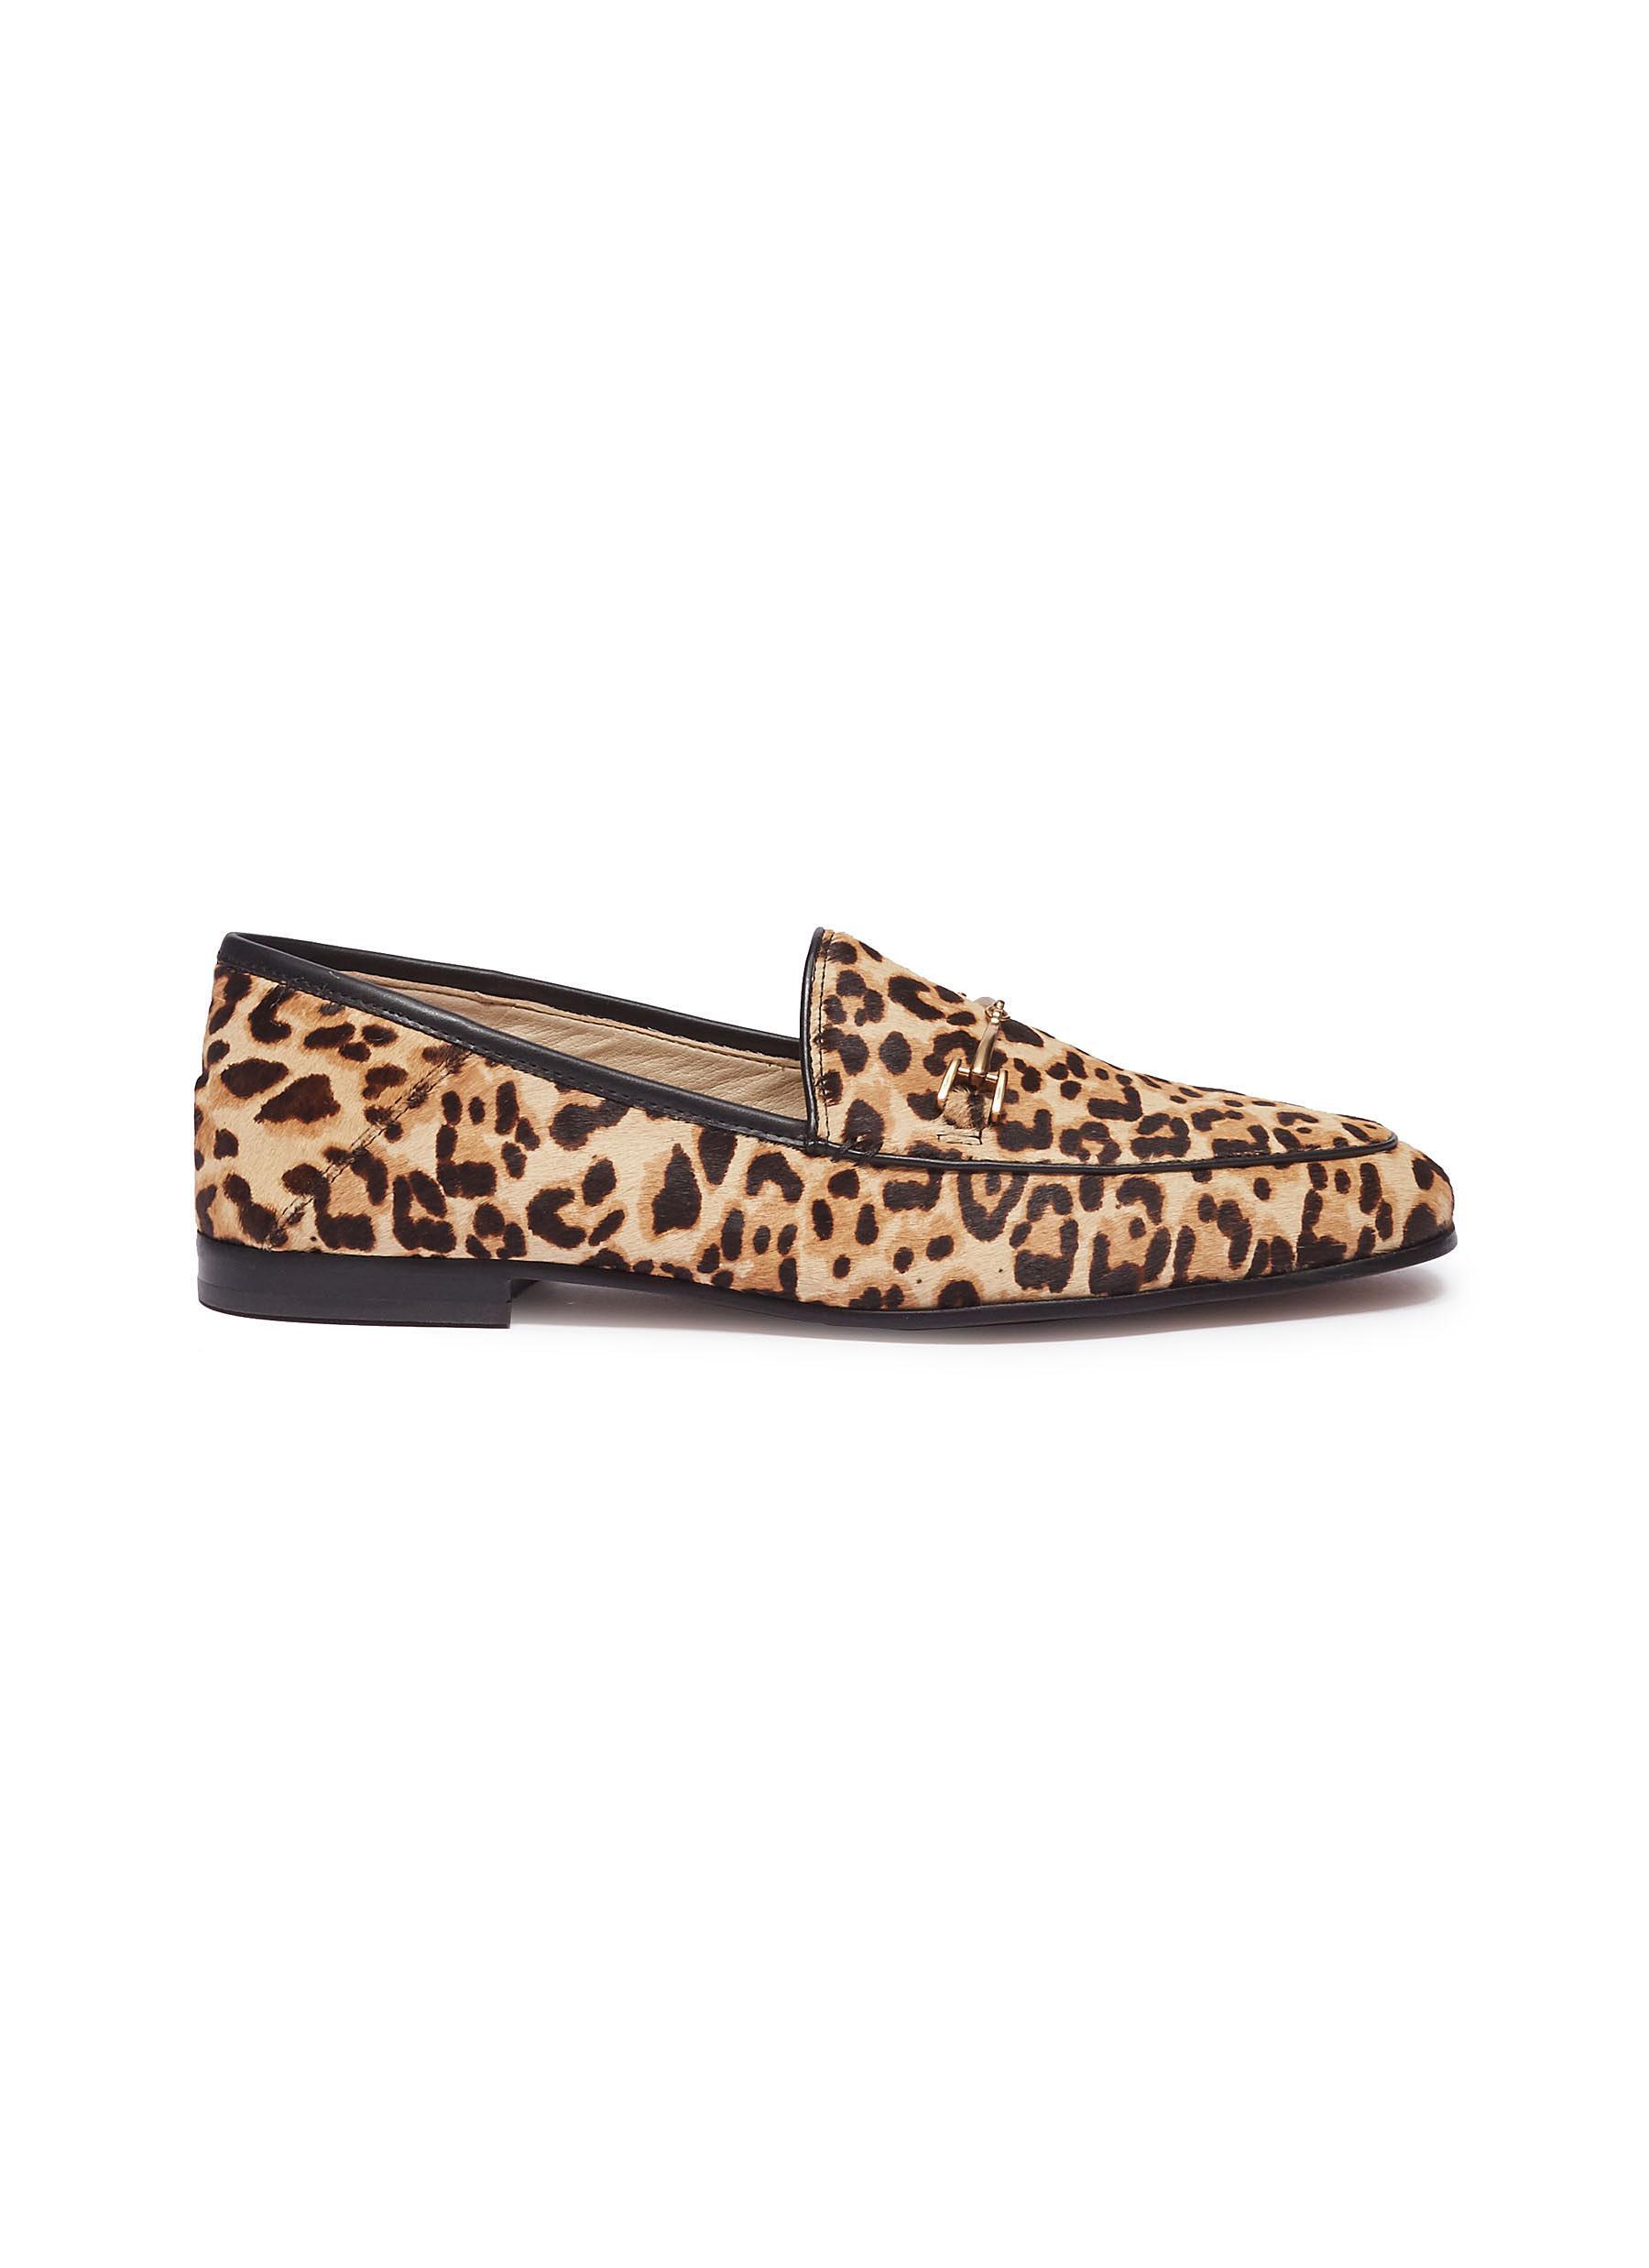 2b762eaf2292 Lyst - Sam Edelman  lorraine  Horsebit Leopard Print Cow Hair Step ...